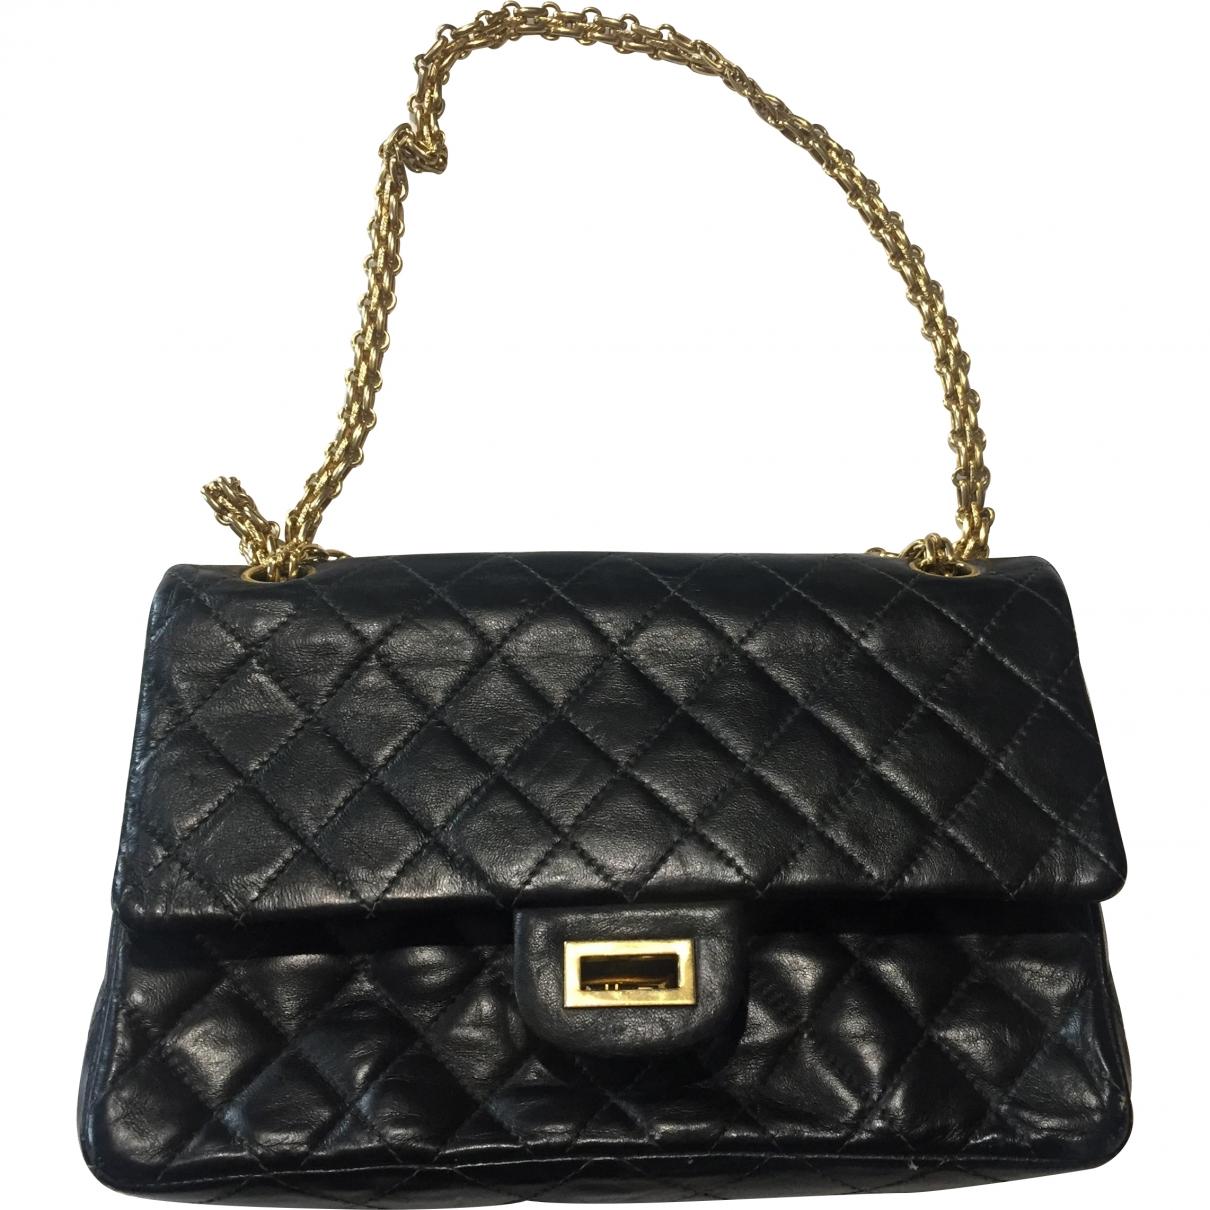 Chanel 2.55 Blue Leather handbag for Women \N